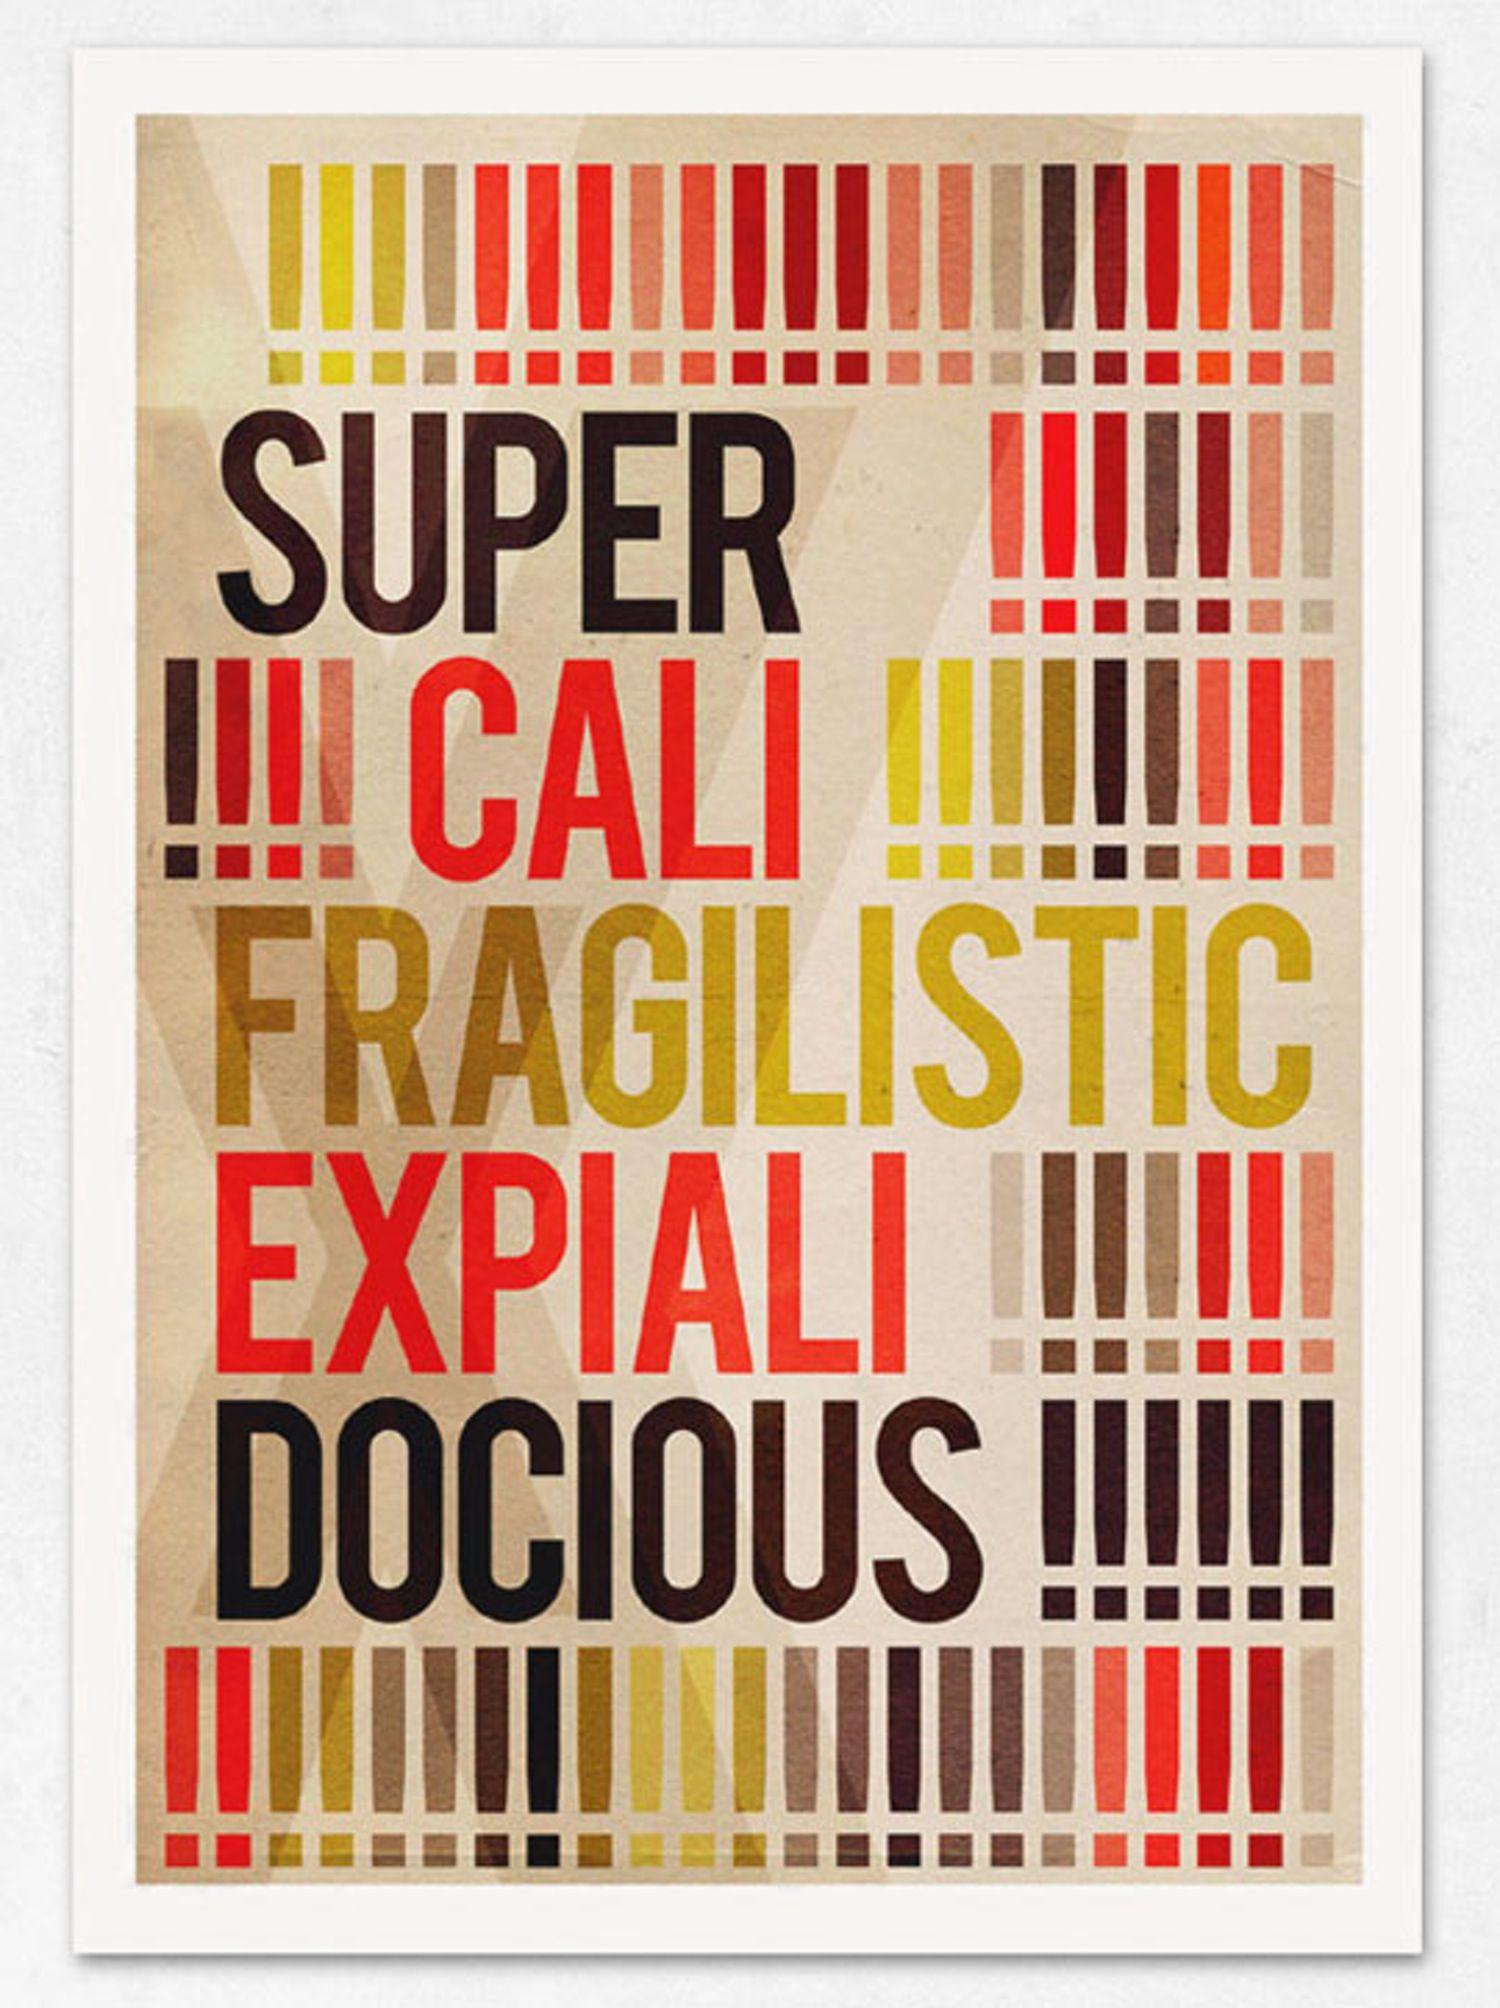 Supercalifragilisticexpialidocious — On the Wall